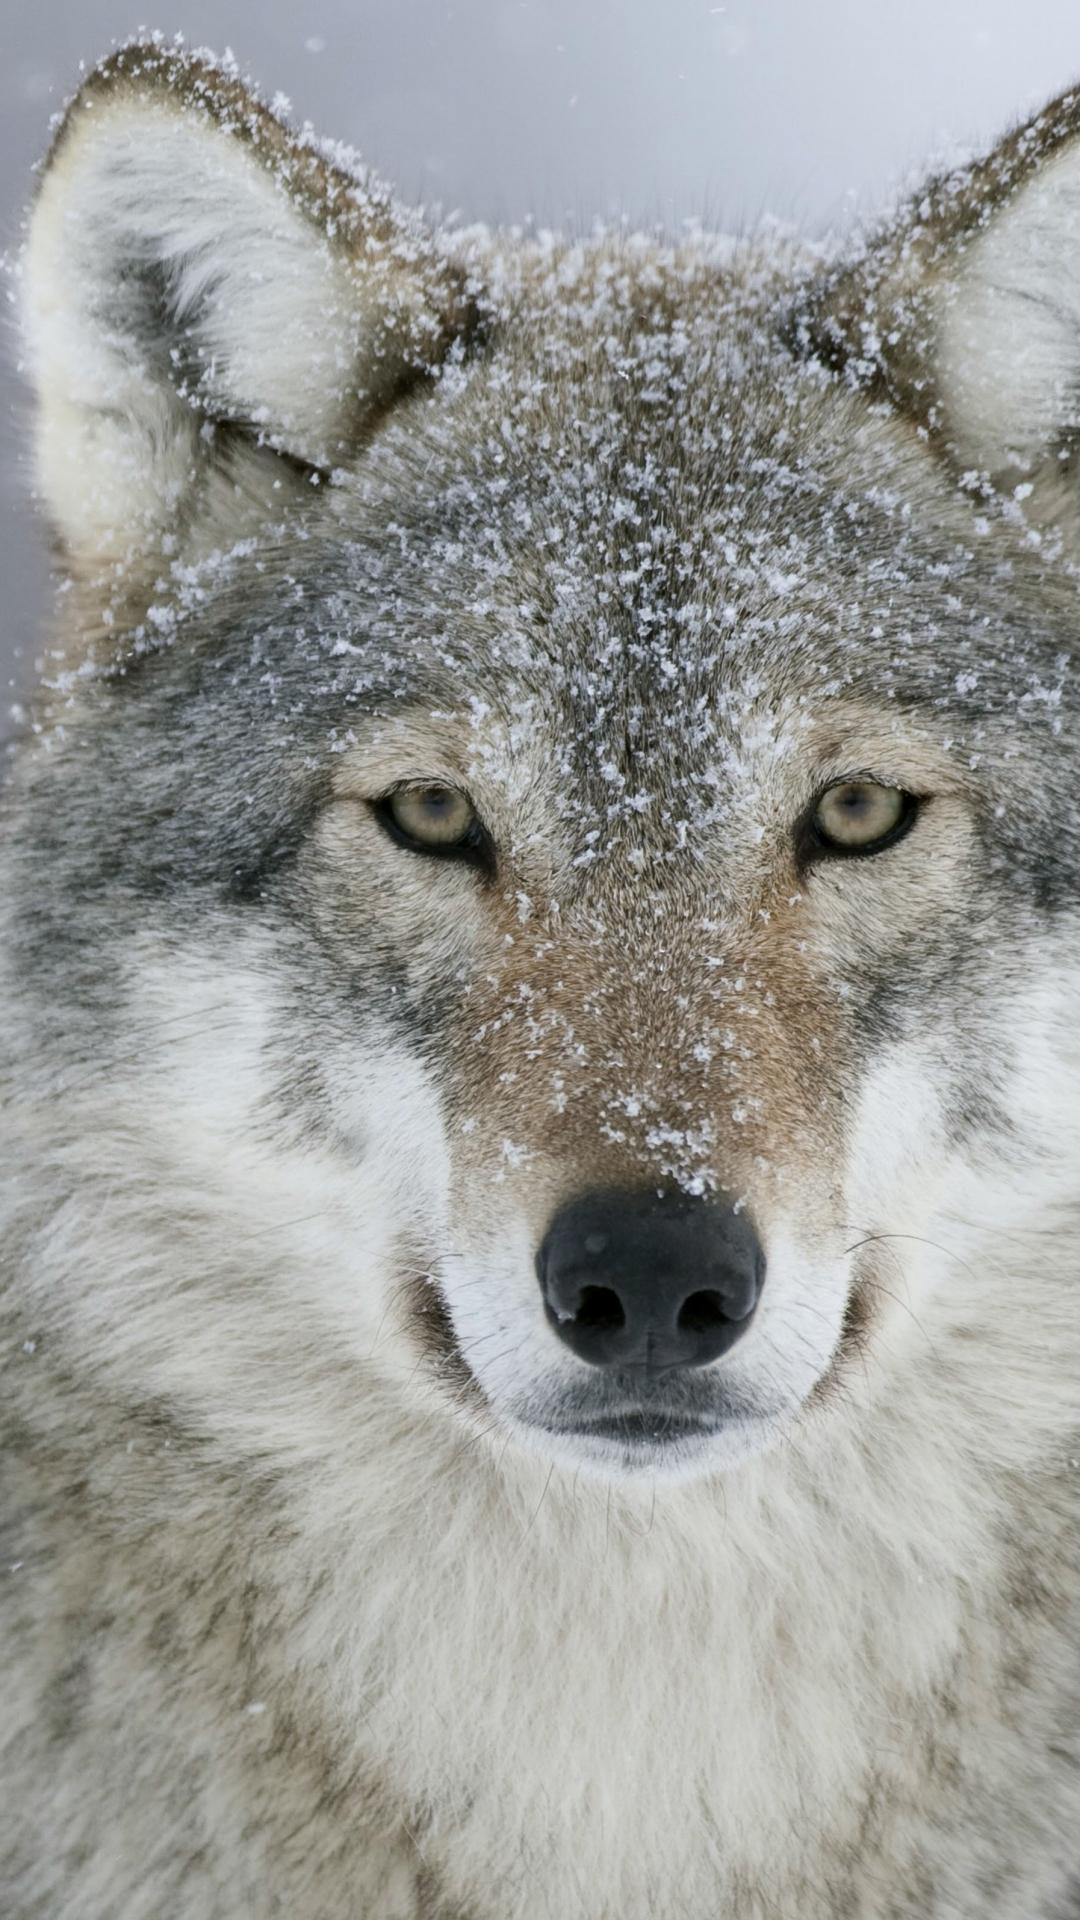 Download Wallpaper Macbook Wolf - 660274  Image_43596.jpg